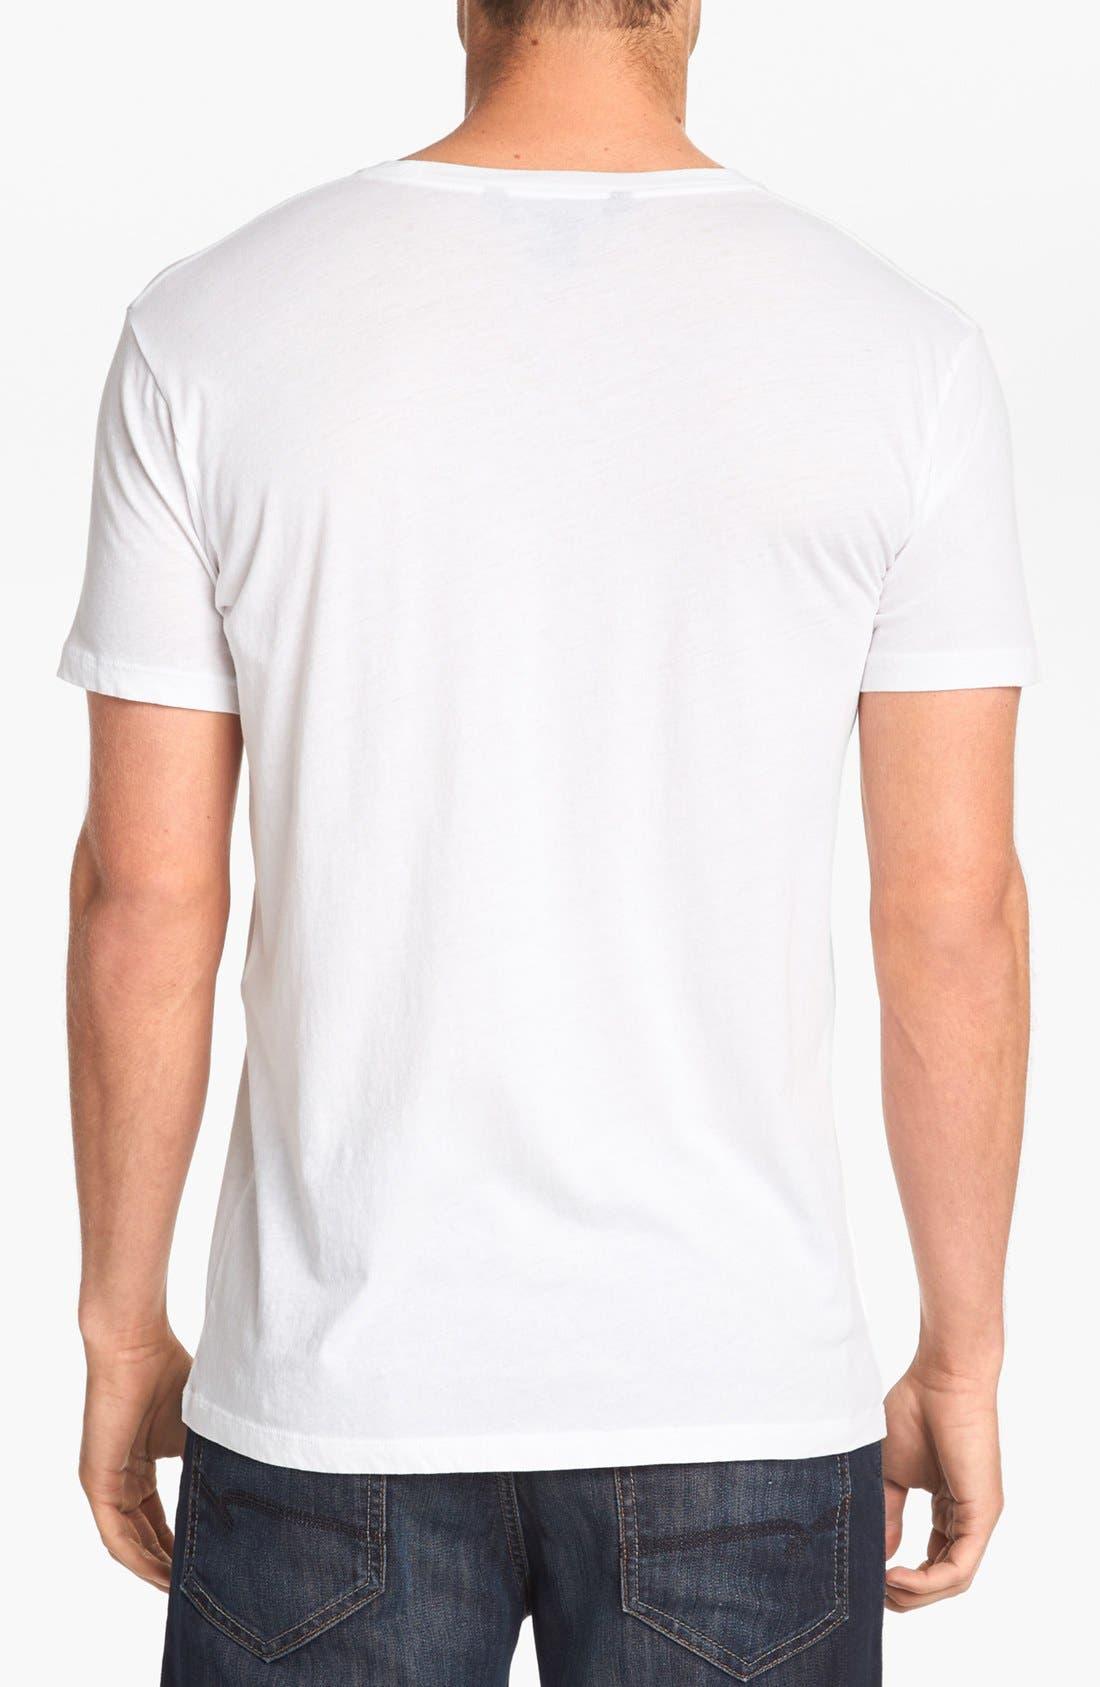 Alternate Image 2  - MARC BY MARC JACOBS Stencil Boots Cotton T-Shirt